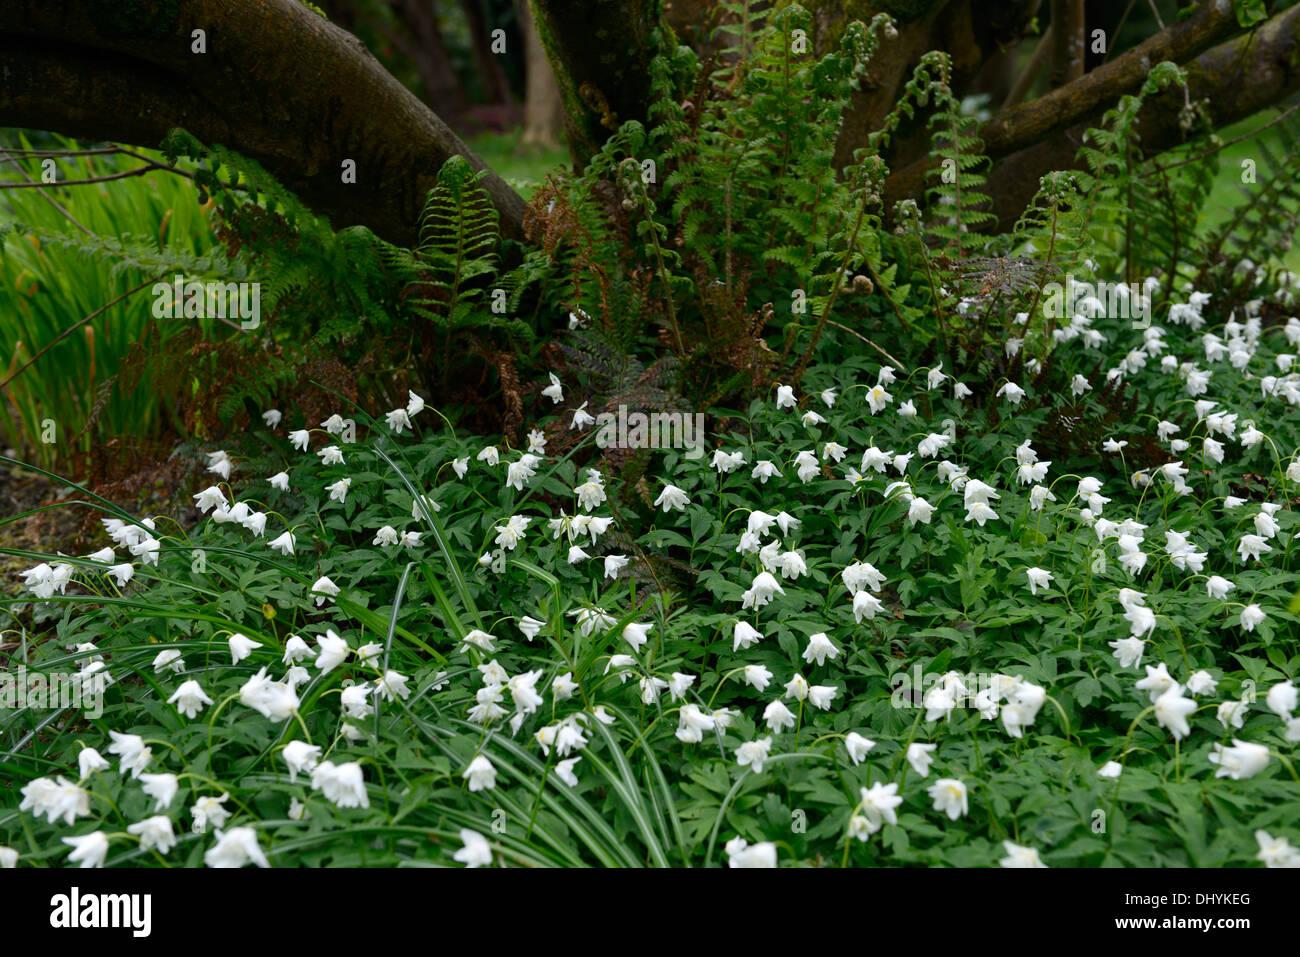 Fiori Bianchi Bosco.Anemone Nemorosa White Flowers Perennial Stock Photos Anemone